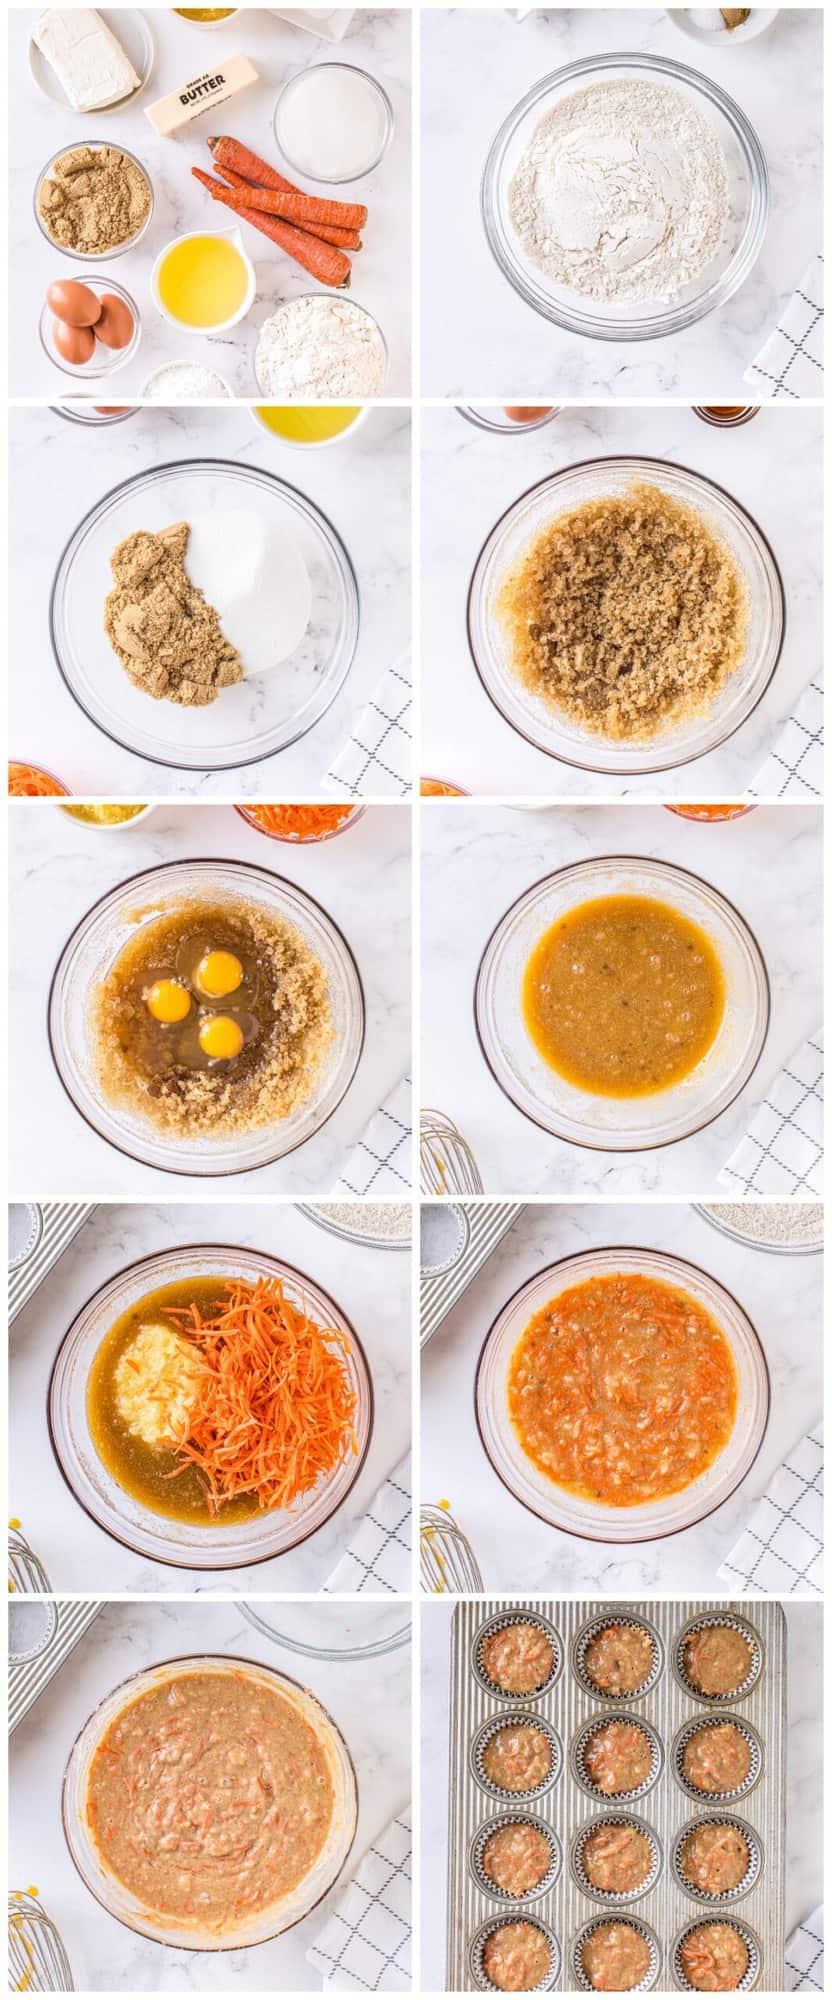 how to make carrot cake cupcakes